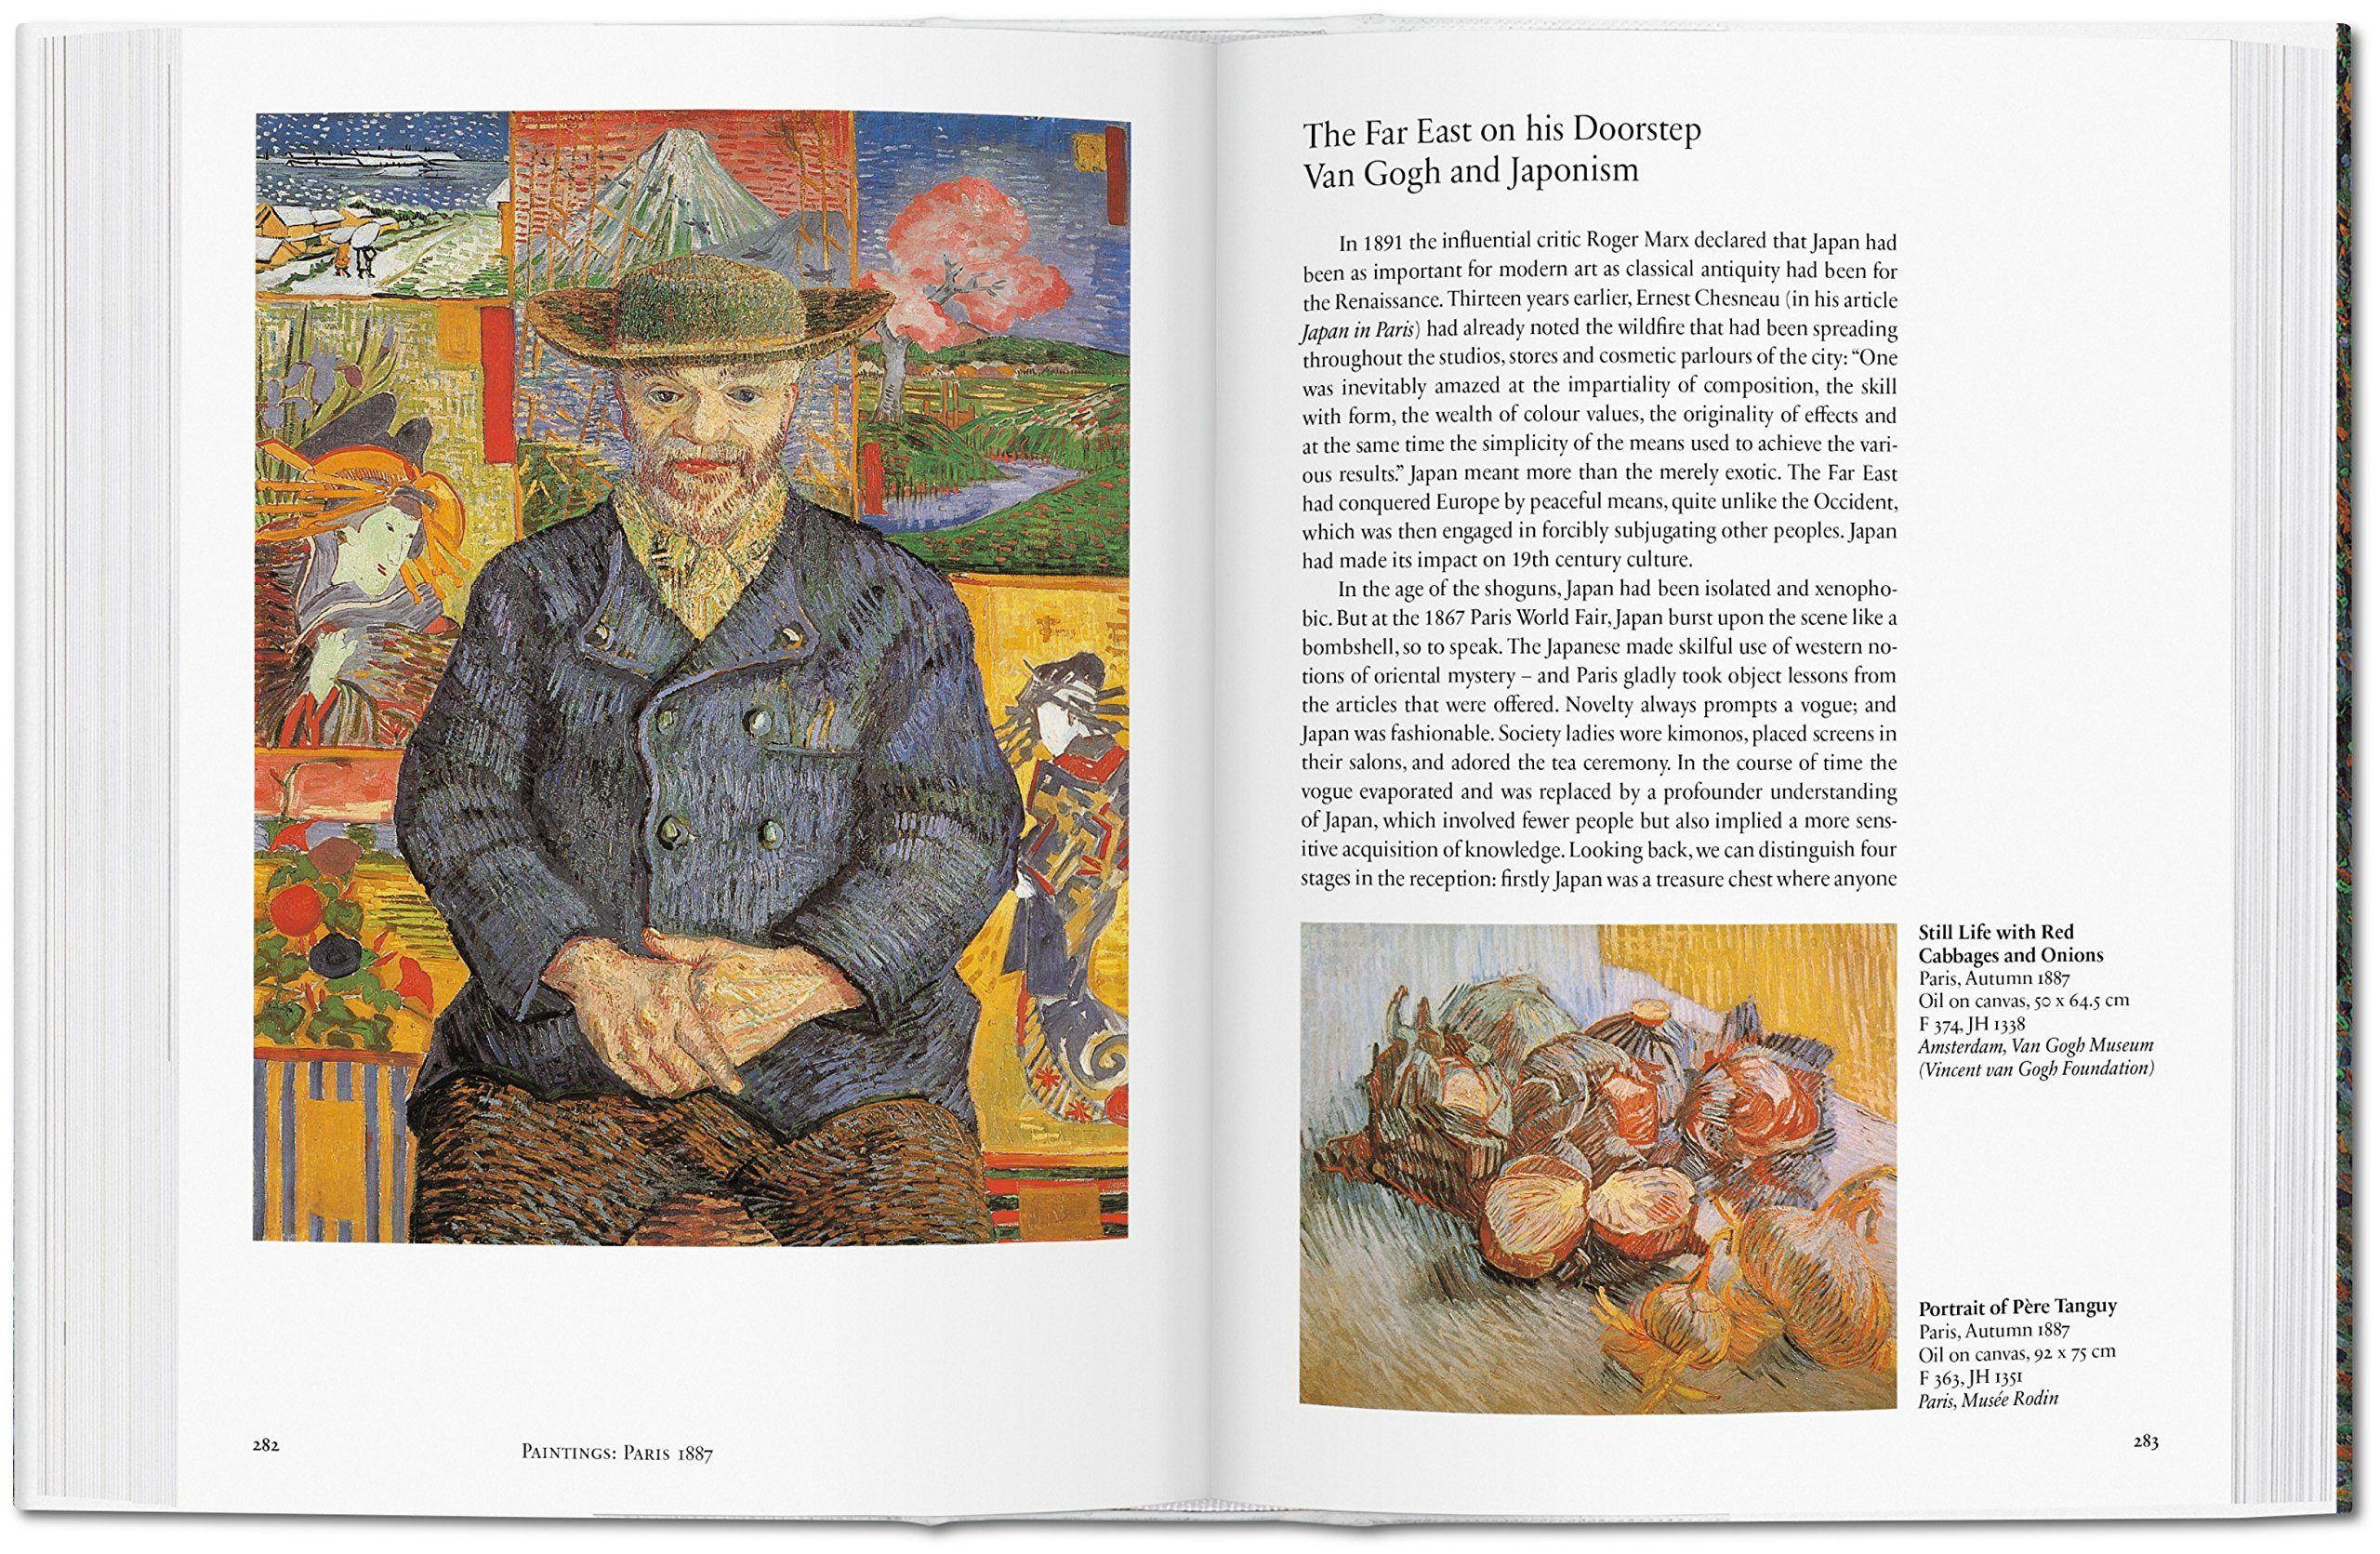 Van Gogh Complete Paintings Basic Art Album Ad Complete Gogh Van Paintings